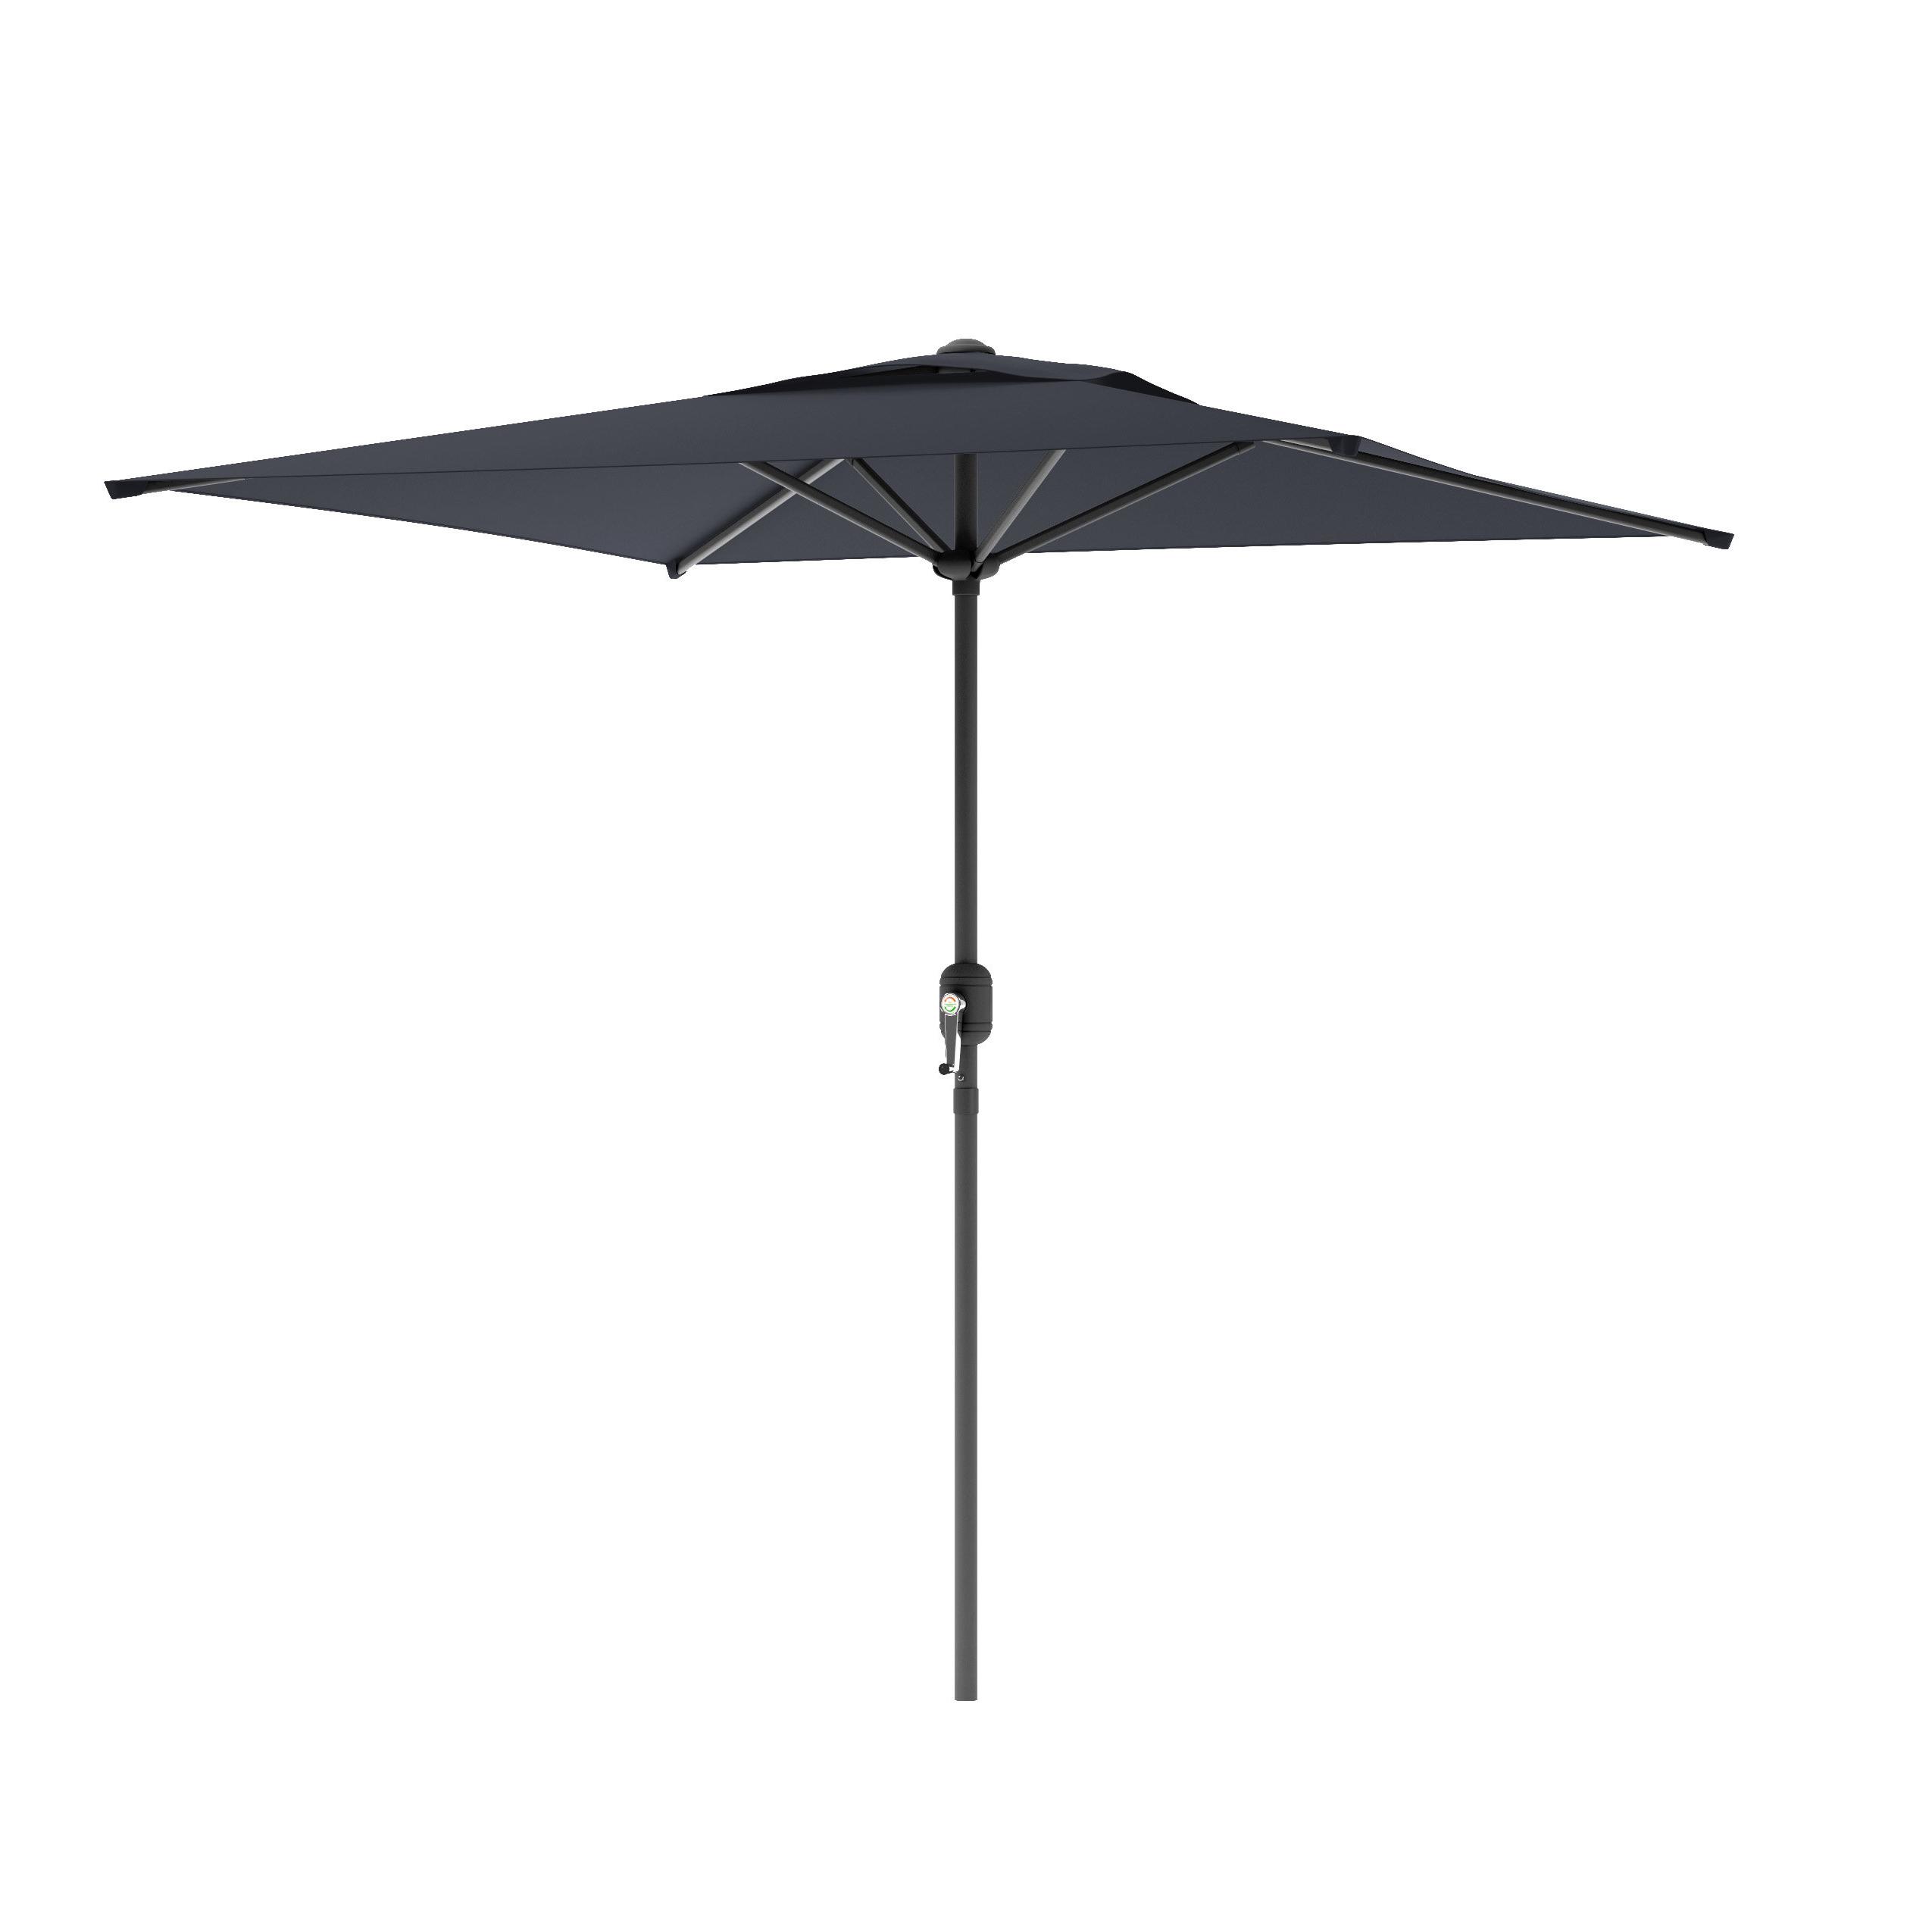 Most Recent Wetherby Market Umbrellas Pertaining To Crowborough 9' Square Market Umbrella (View 2 of 20)